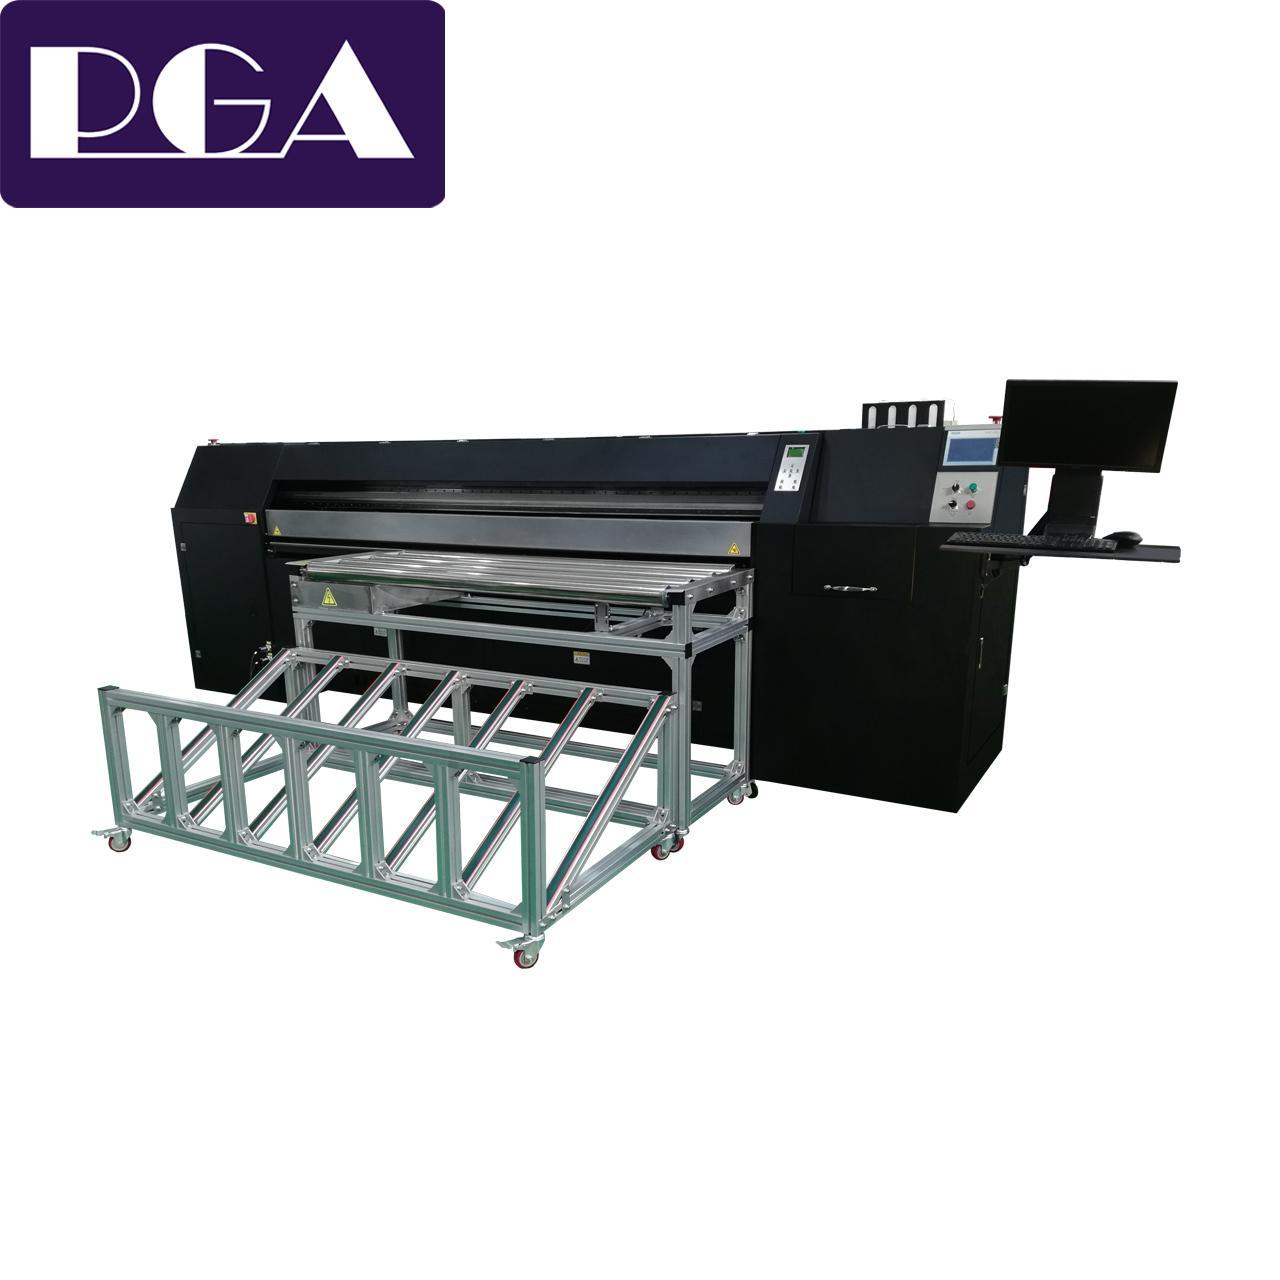 Corrugated carton digital printer box production inkjet digital printer 1